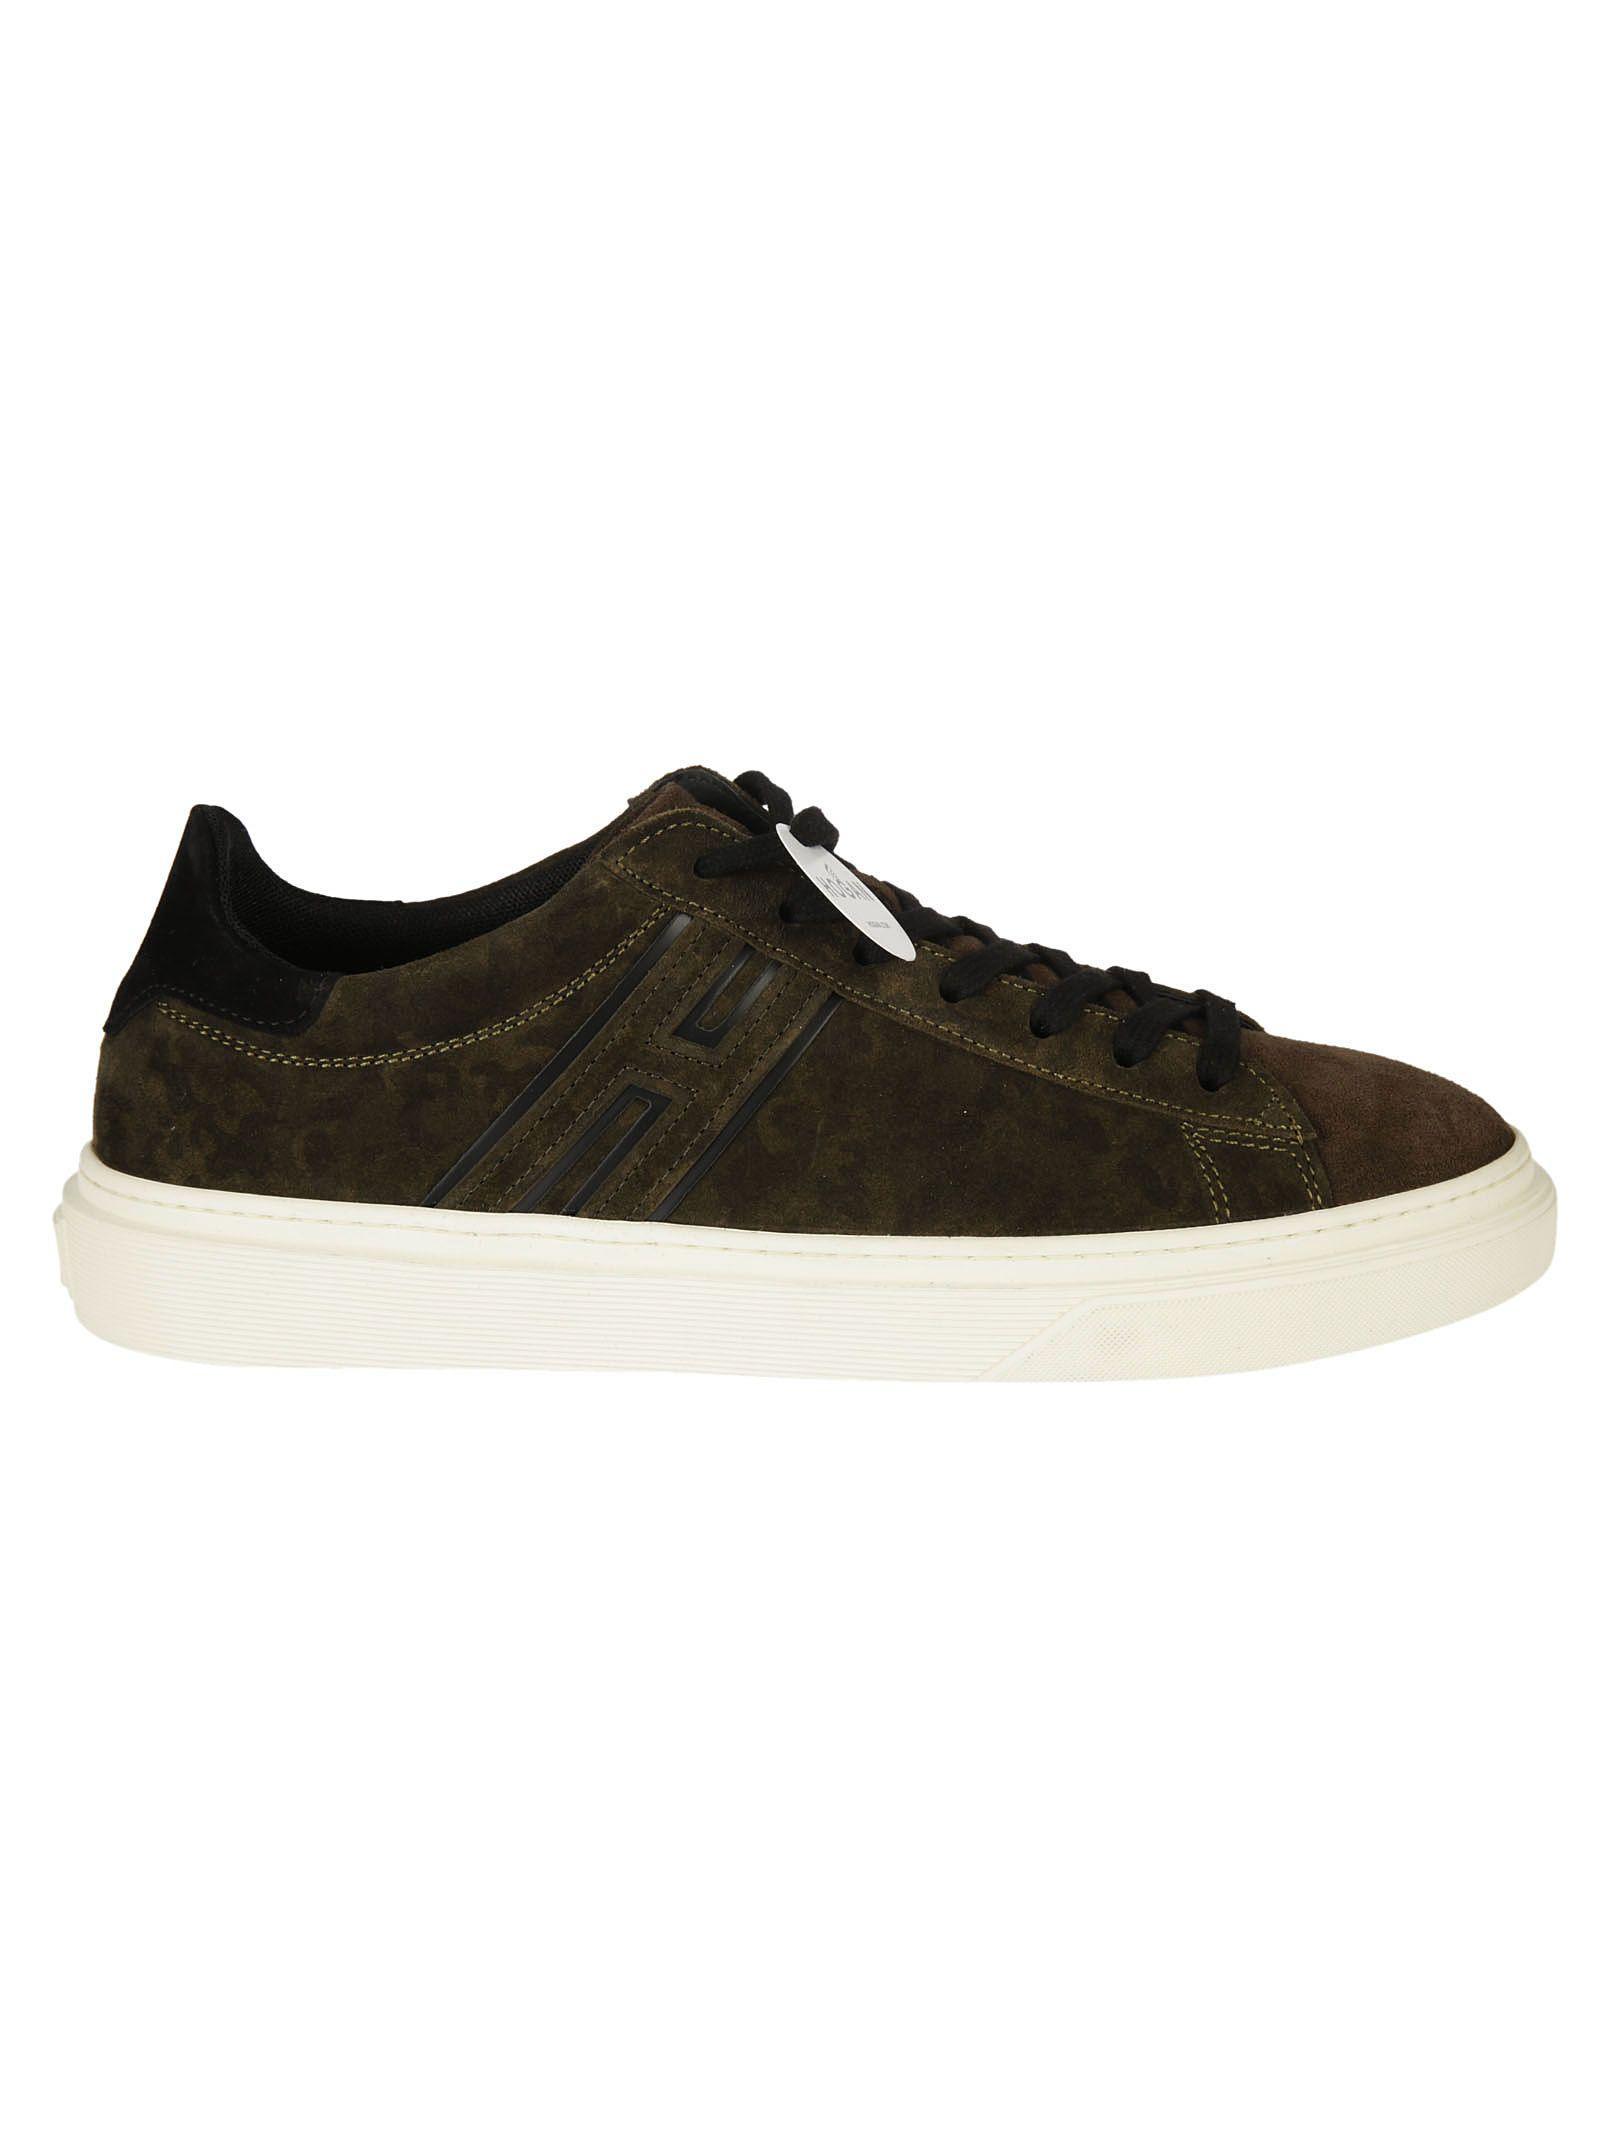 Shop Hogan H340 Sneakers In Verde-nero-moro